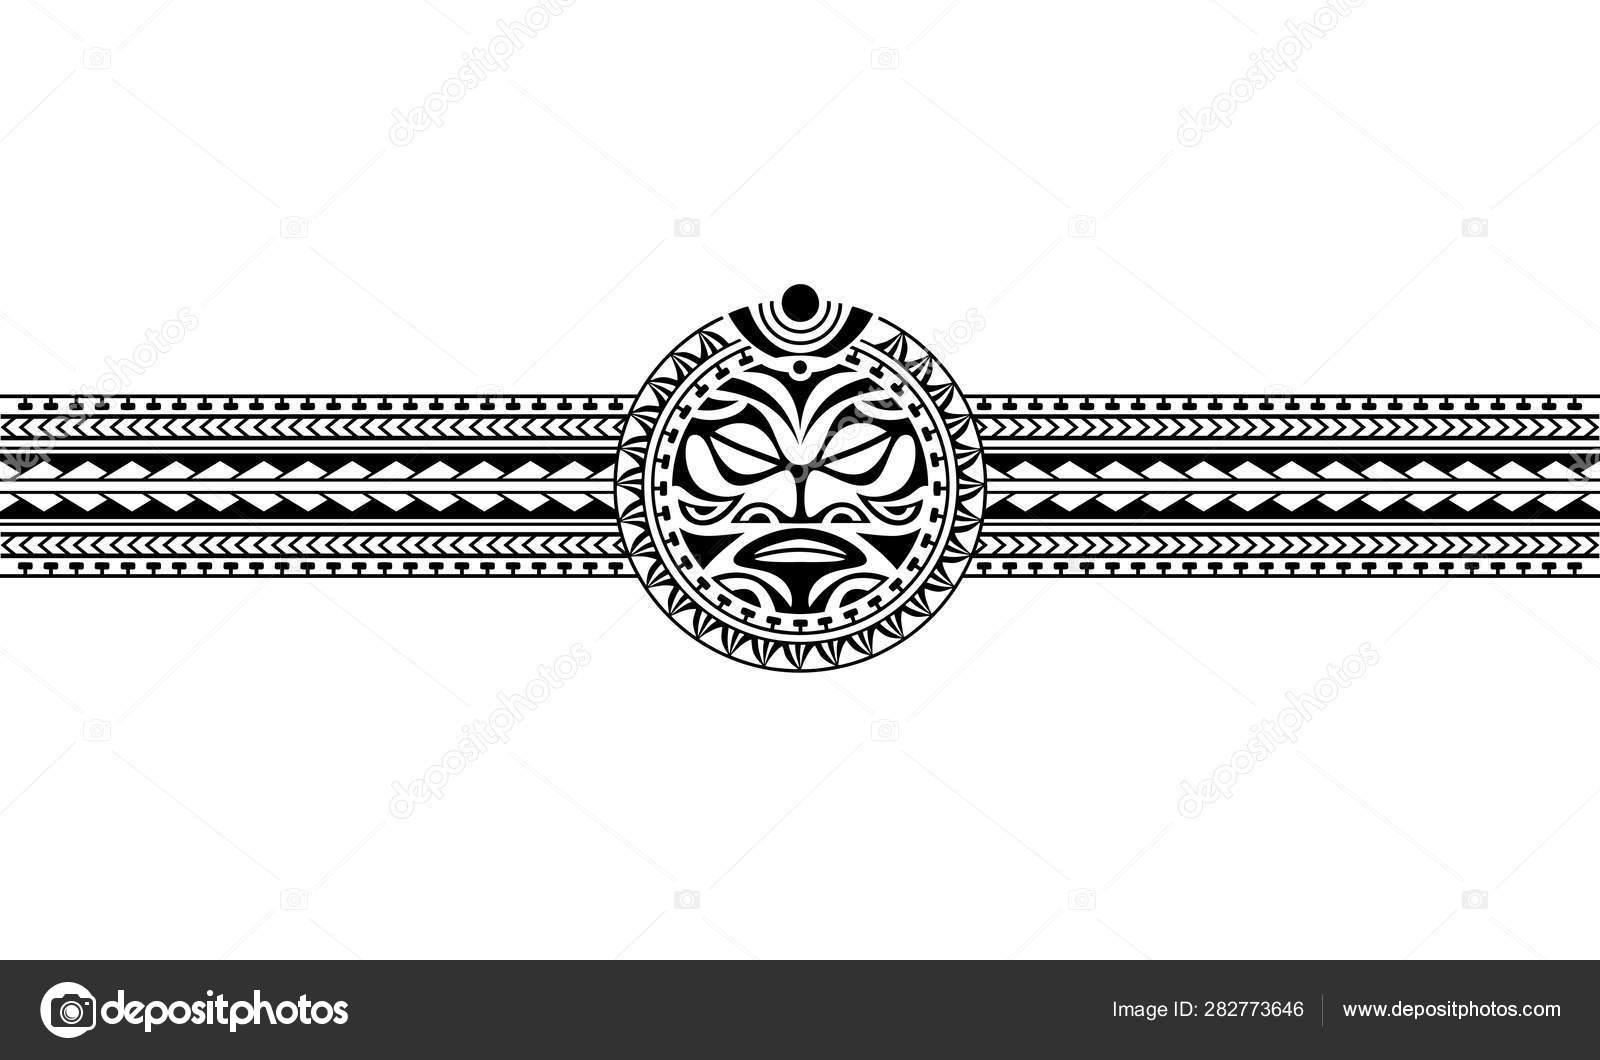 Maori polynesian tattoo border tribal sleeve pattern vector